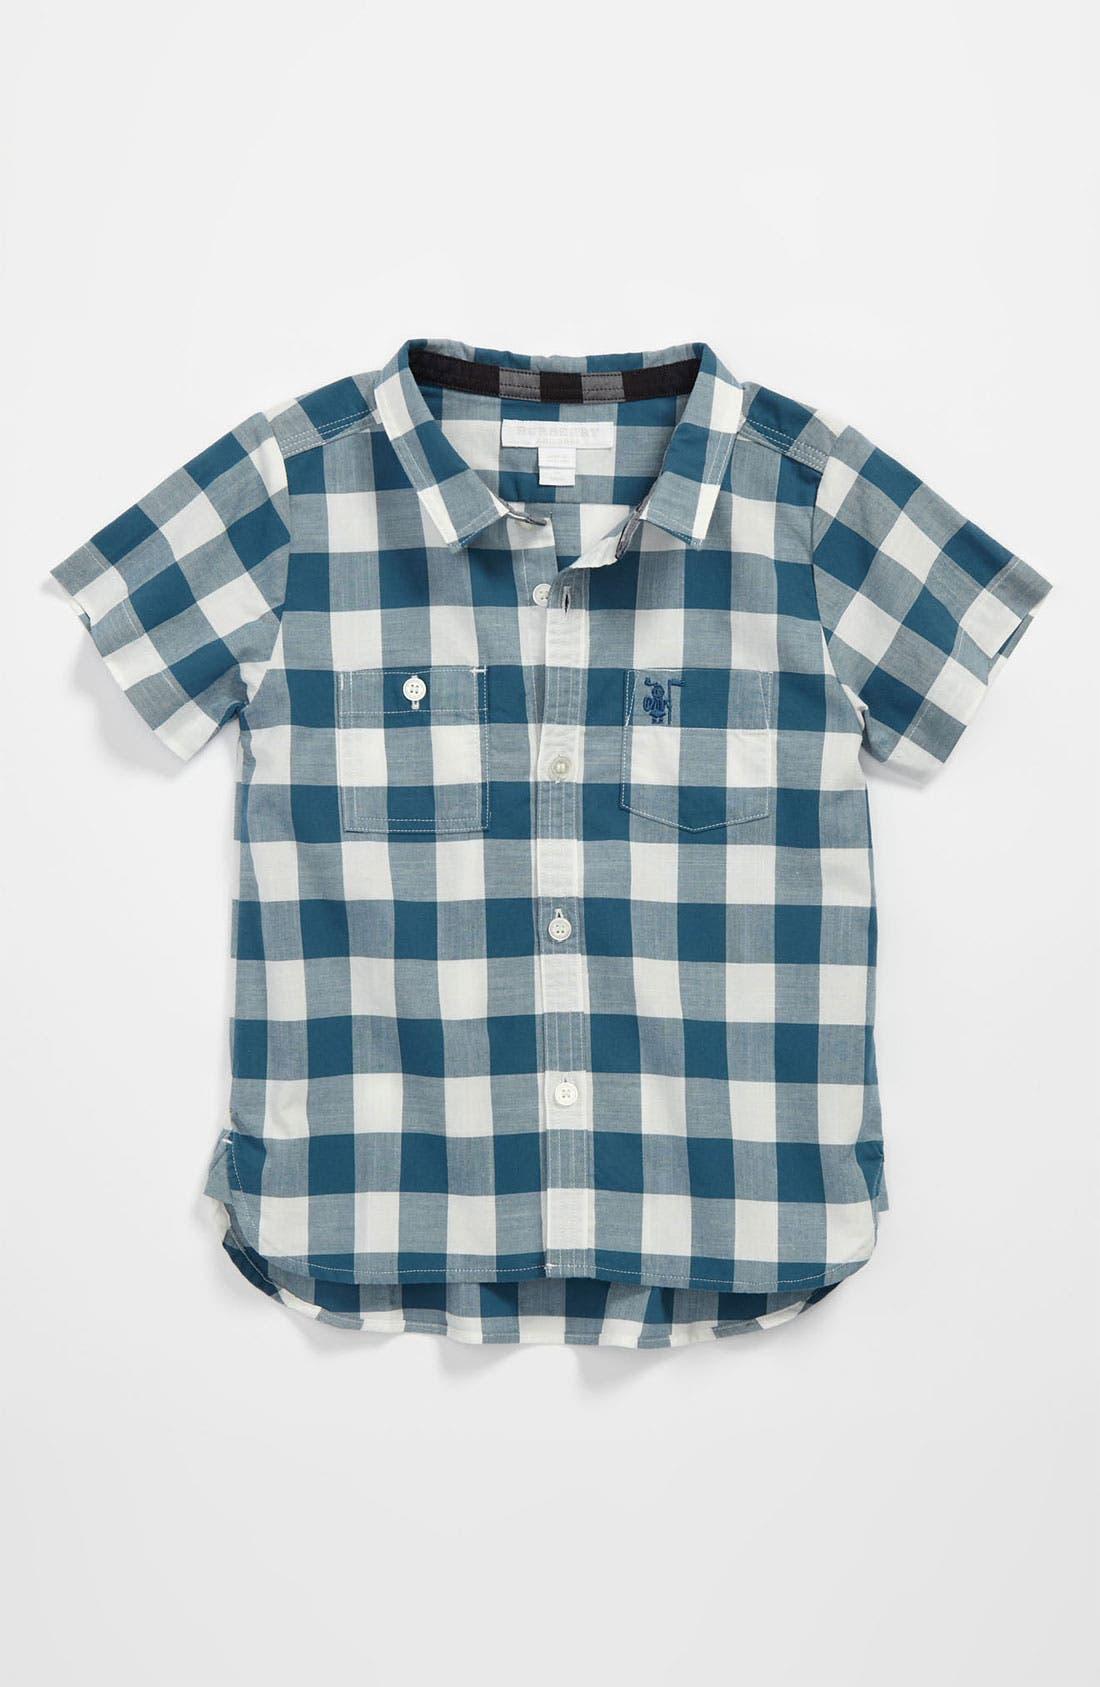 Alternate Image 1 Selected - Burberry 'Mini Rex' Woven Shirt (Toddler)